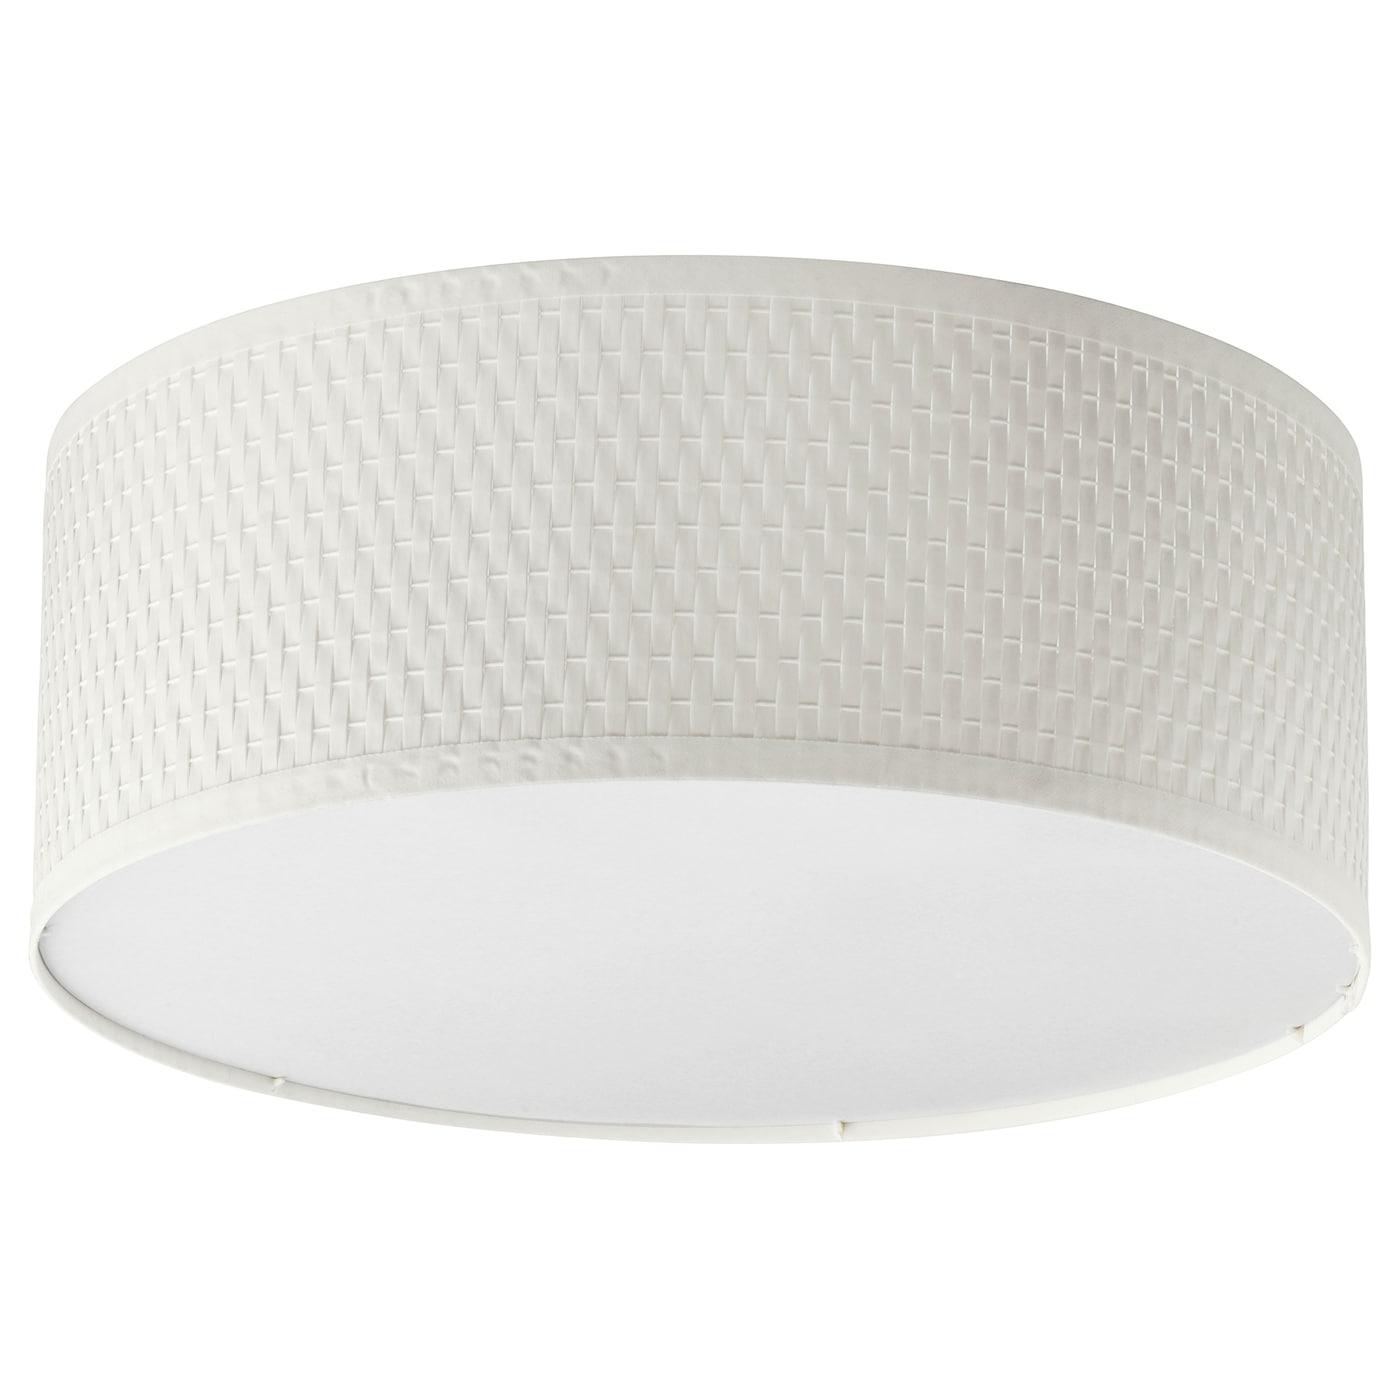 Plafondlampen - IKEA